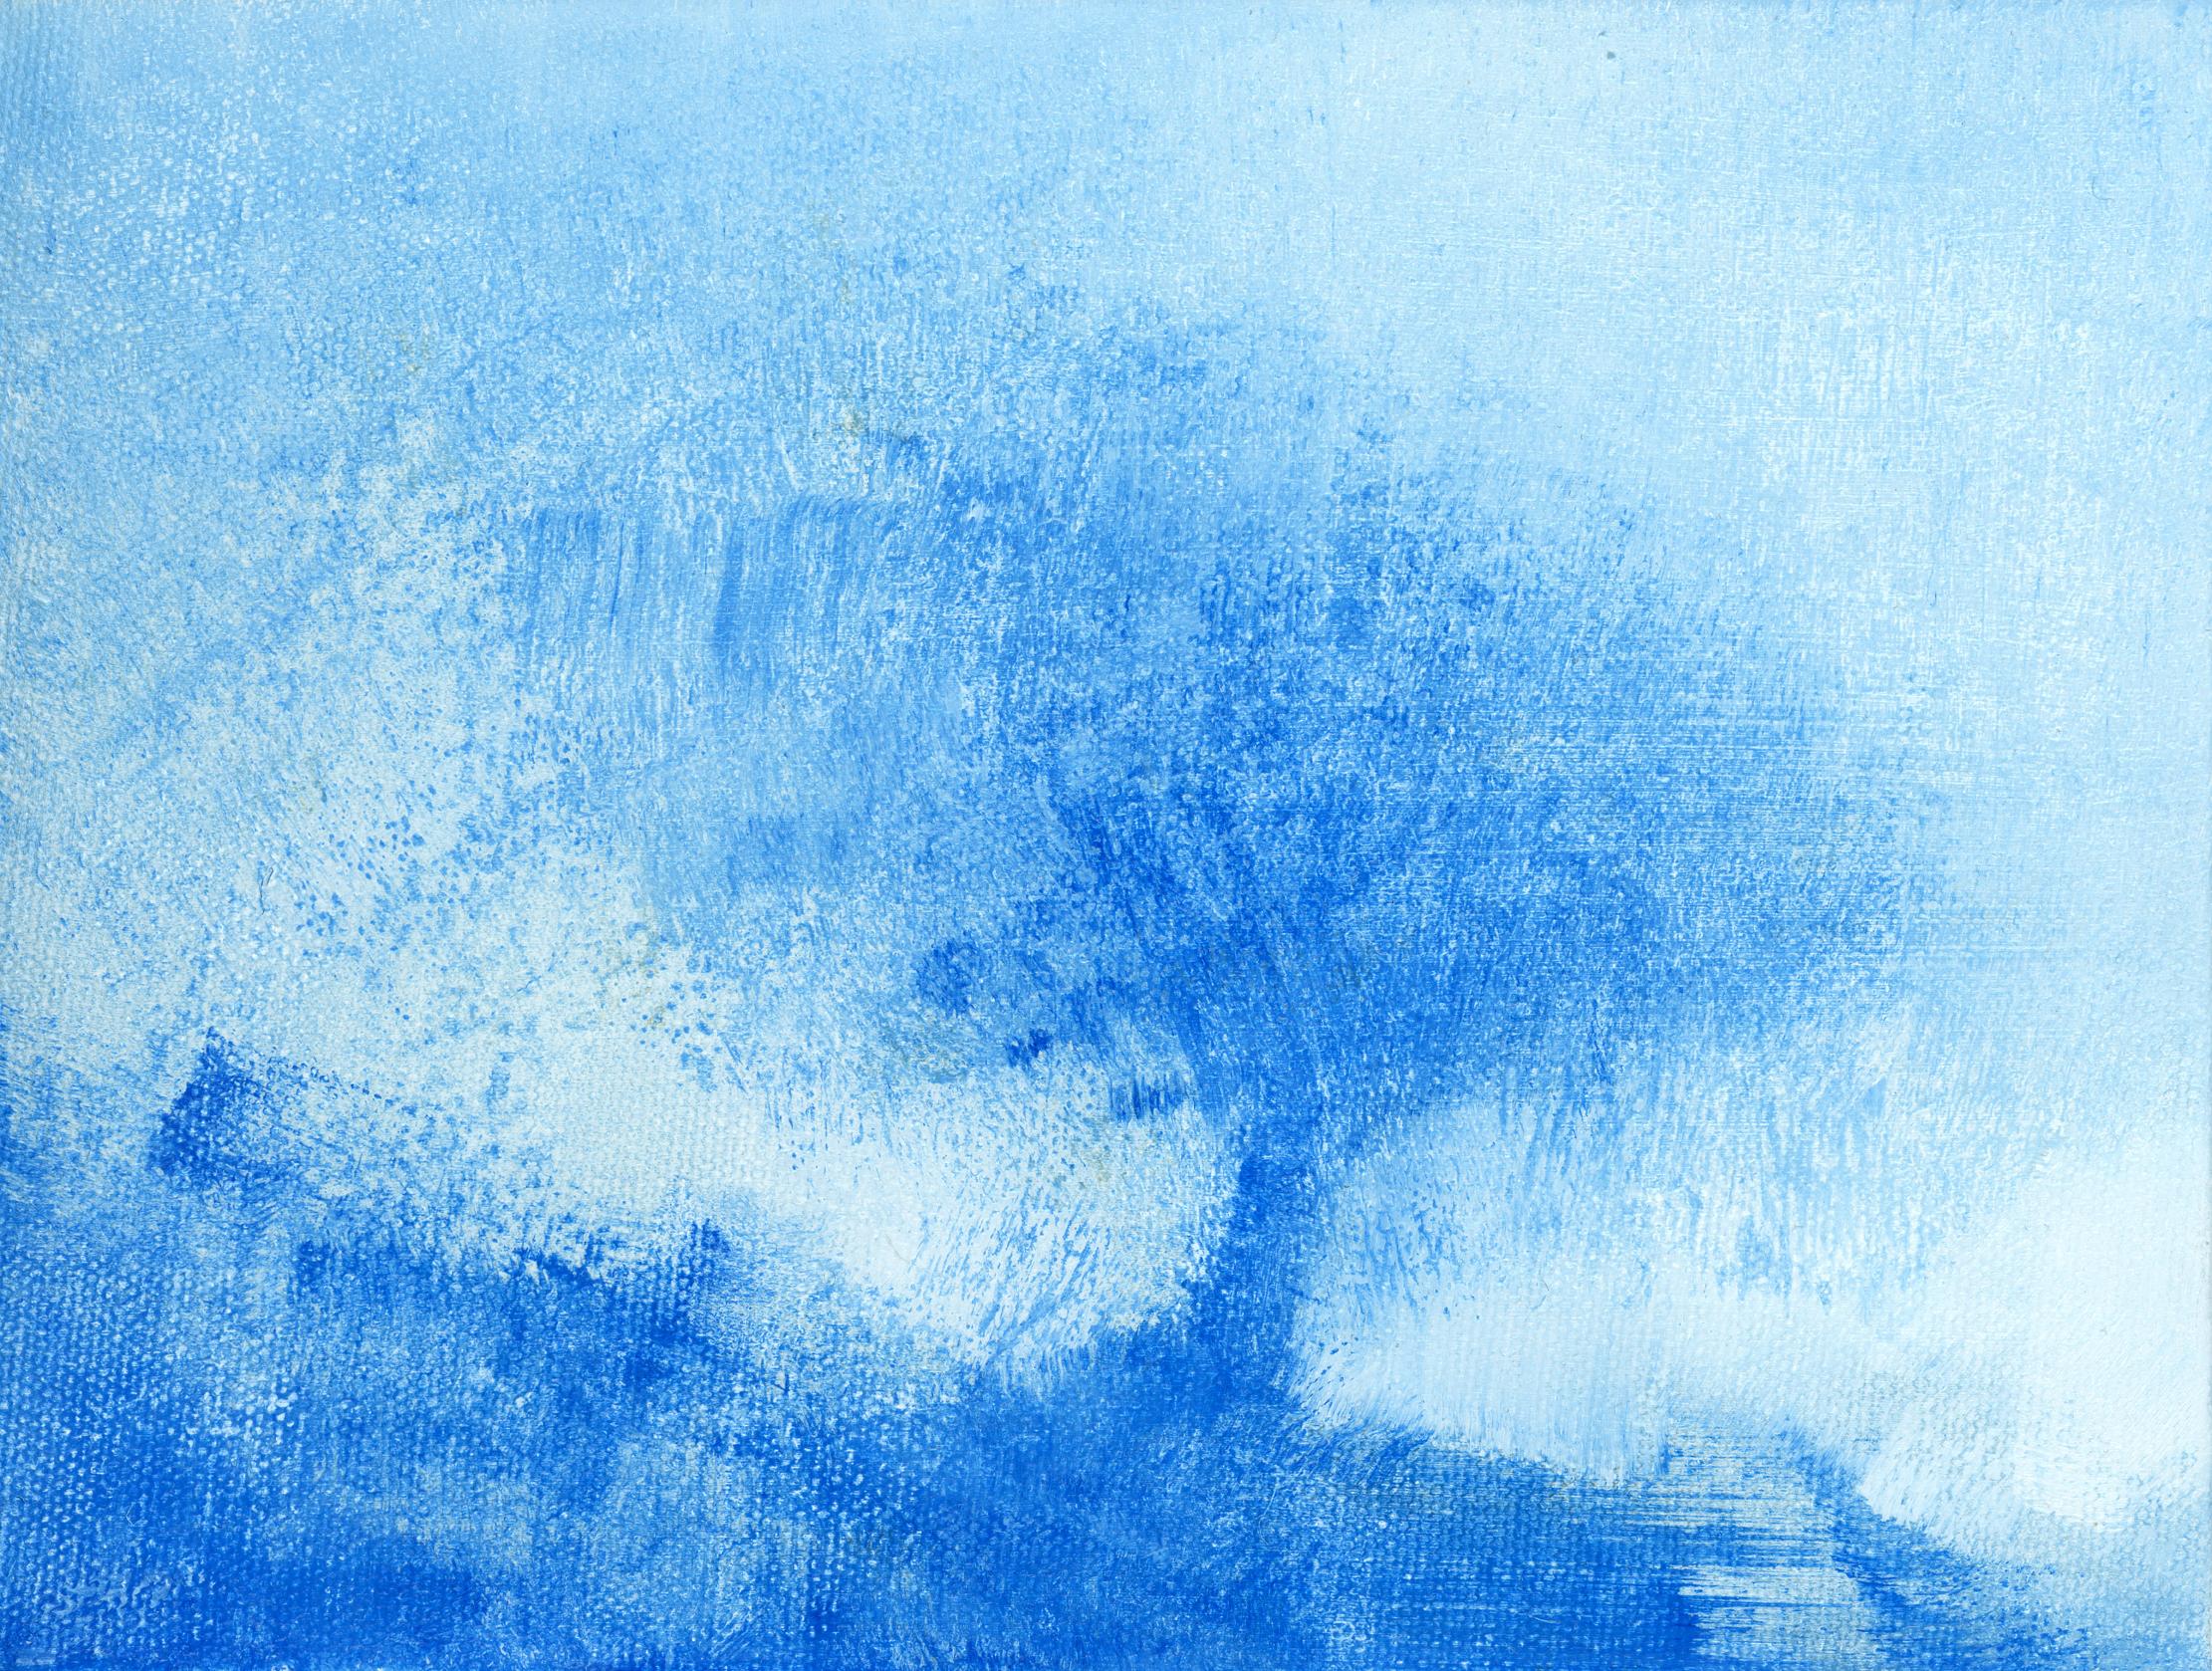 Glenn-Suokko-Landscape-917-2.jpg